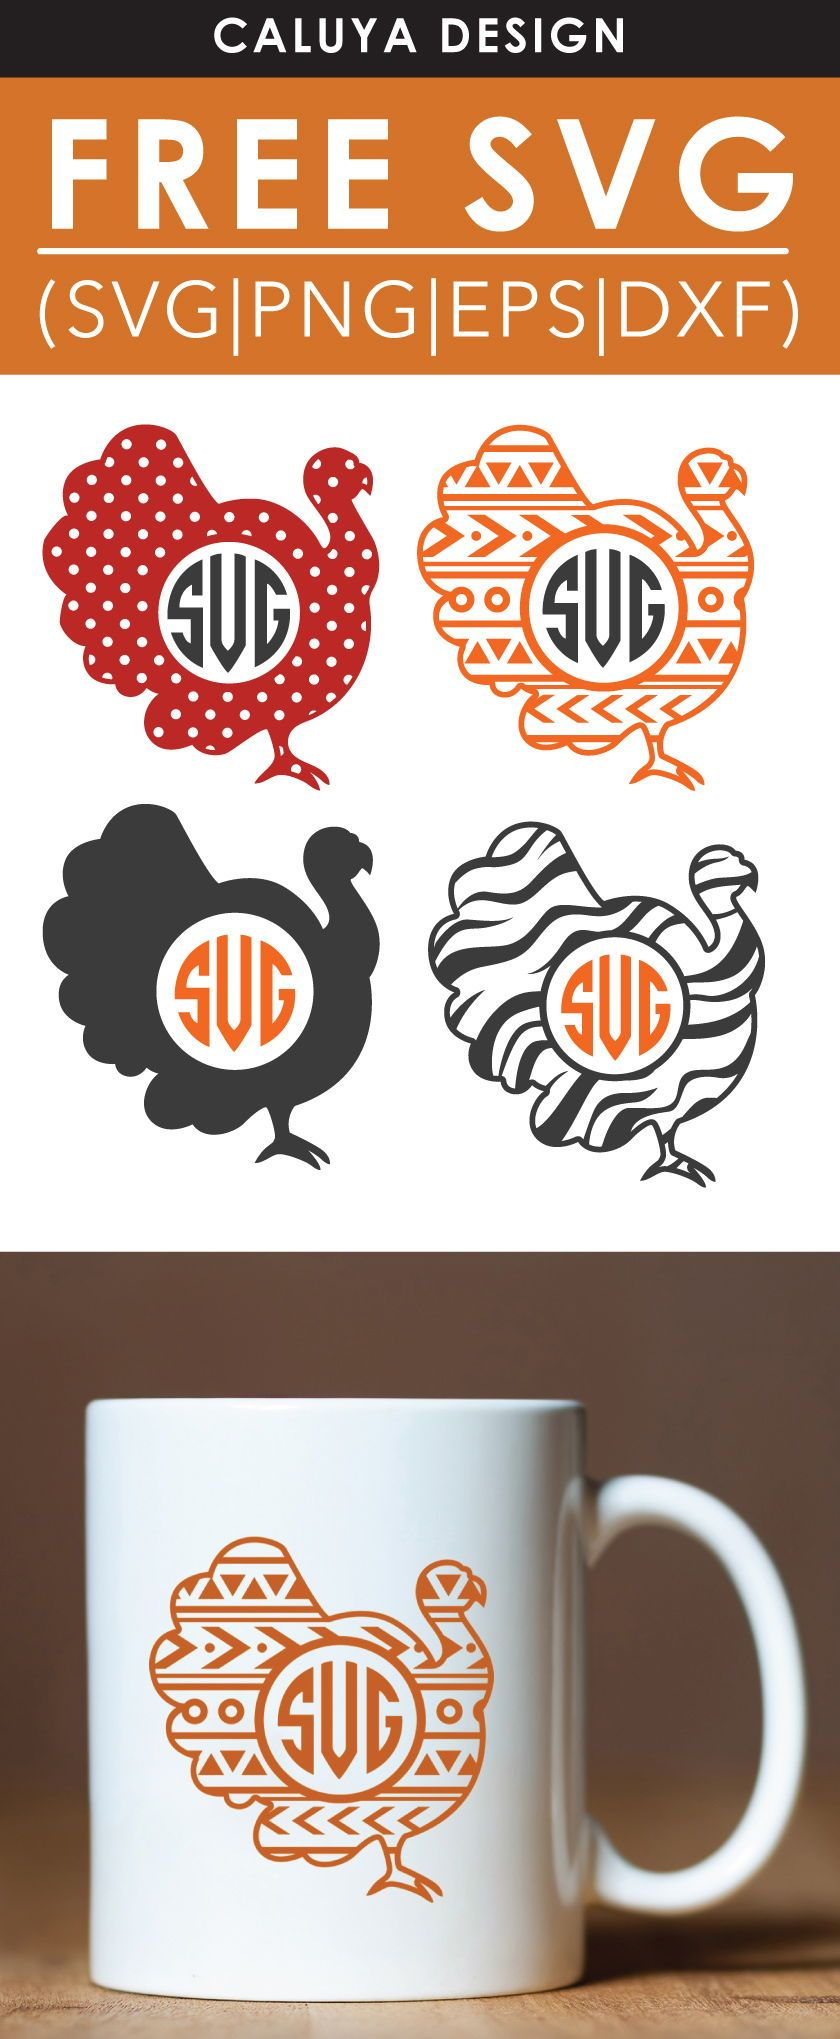 Free turkey monogram SVG, PNG, EPS & DXF by Monogram svg